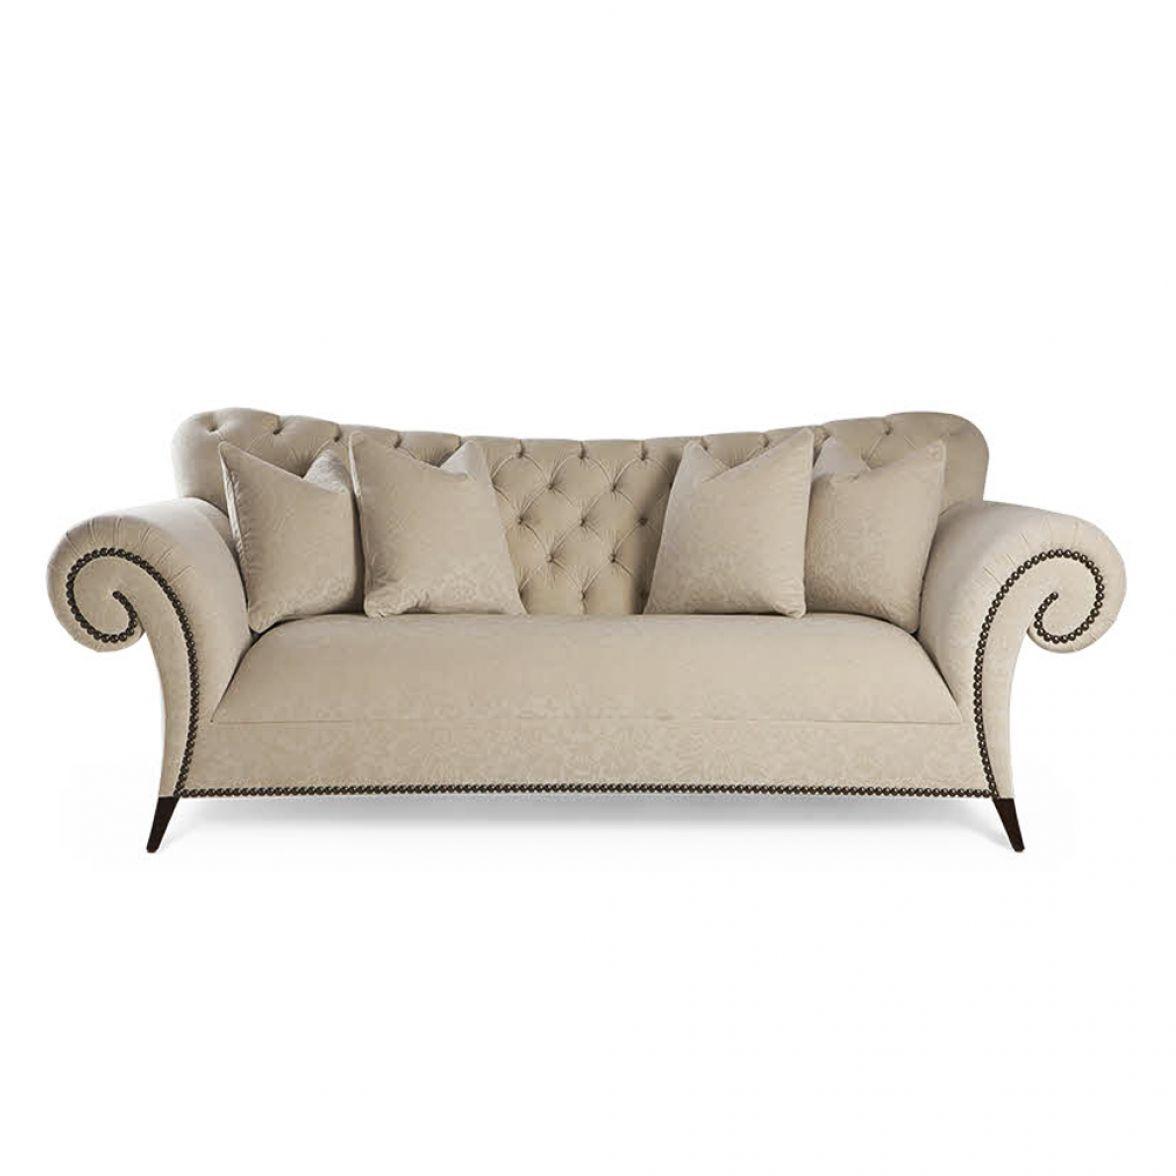 LOUBOUTIN sofa